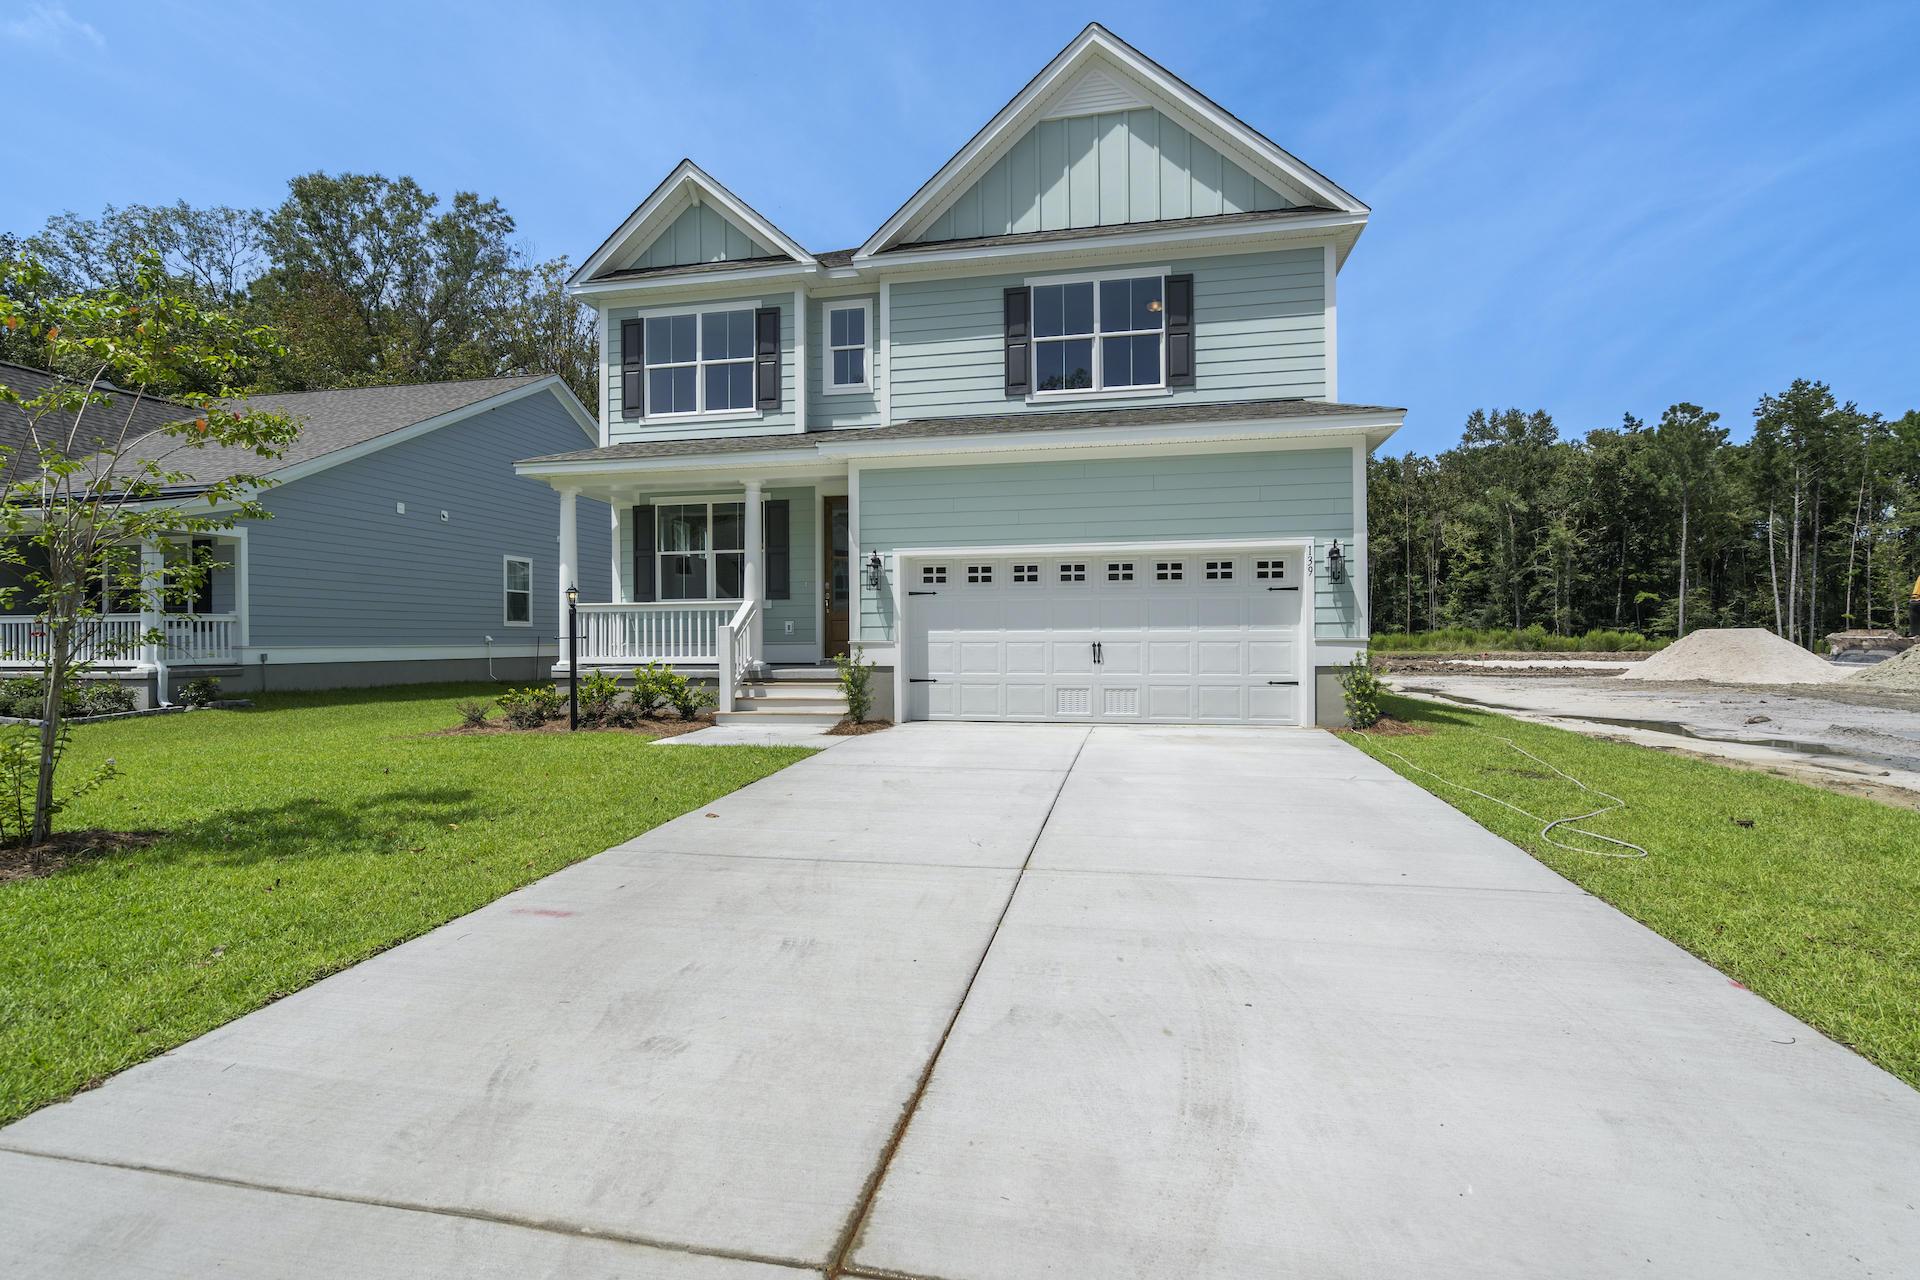 Drayton Oaks Homes For Sale - 105 Plowden Mill, Summerville, SC - 29